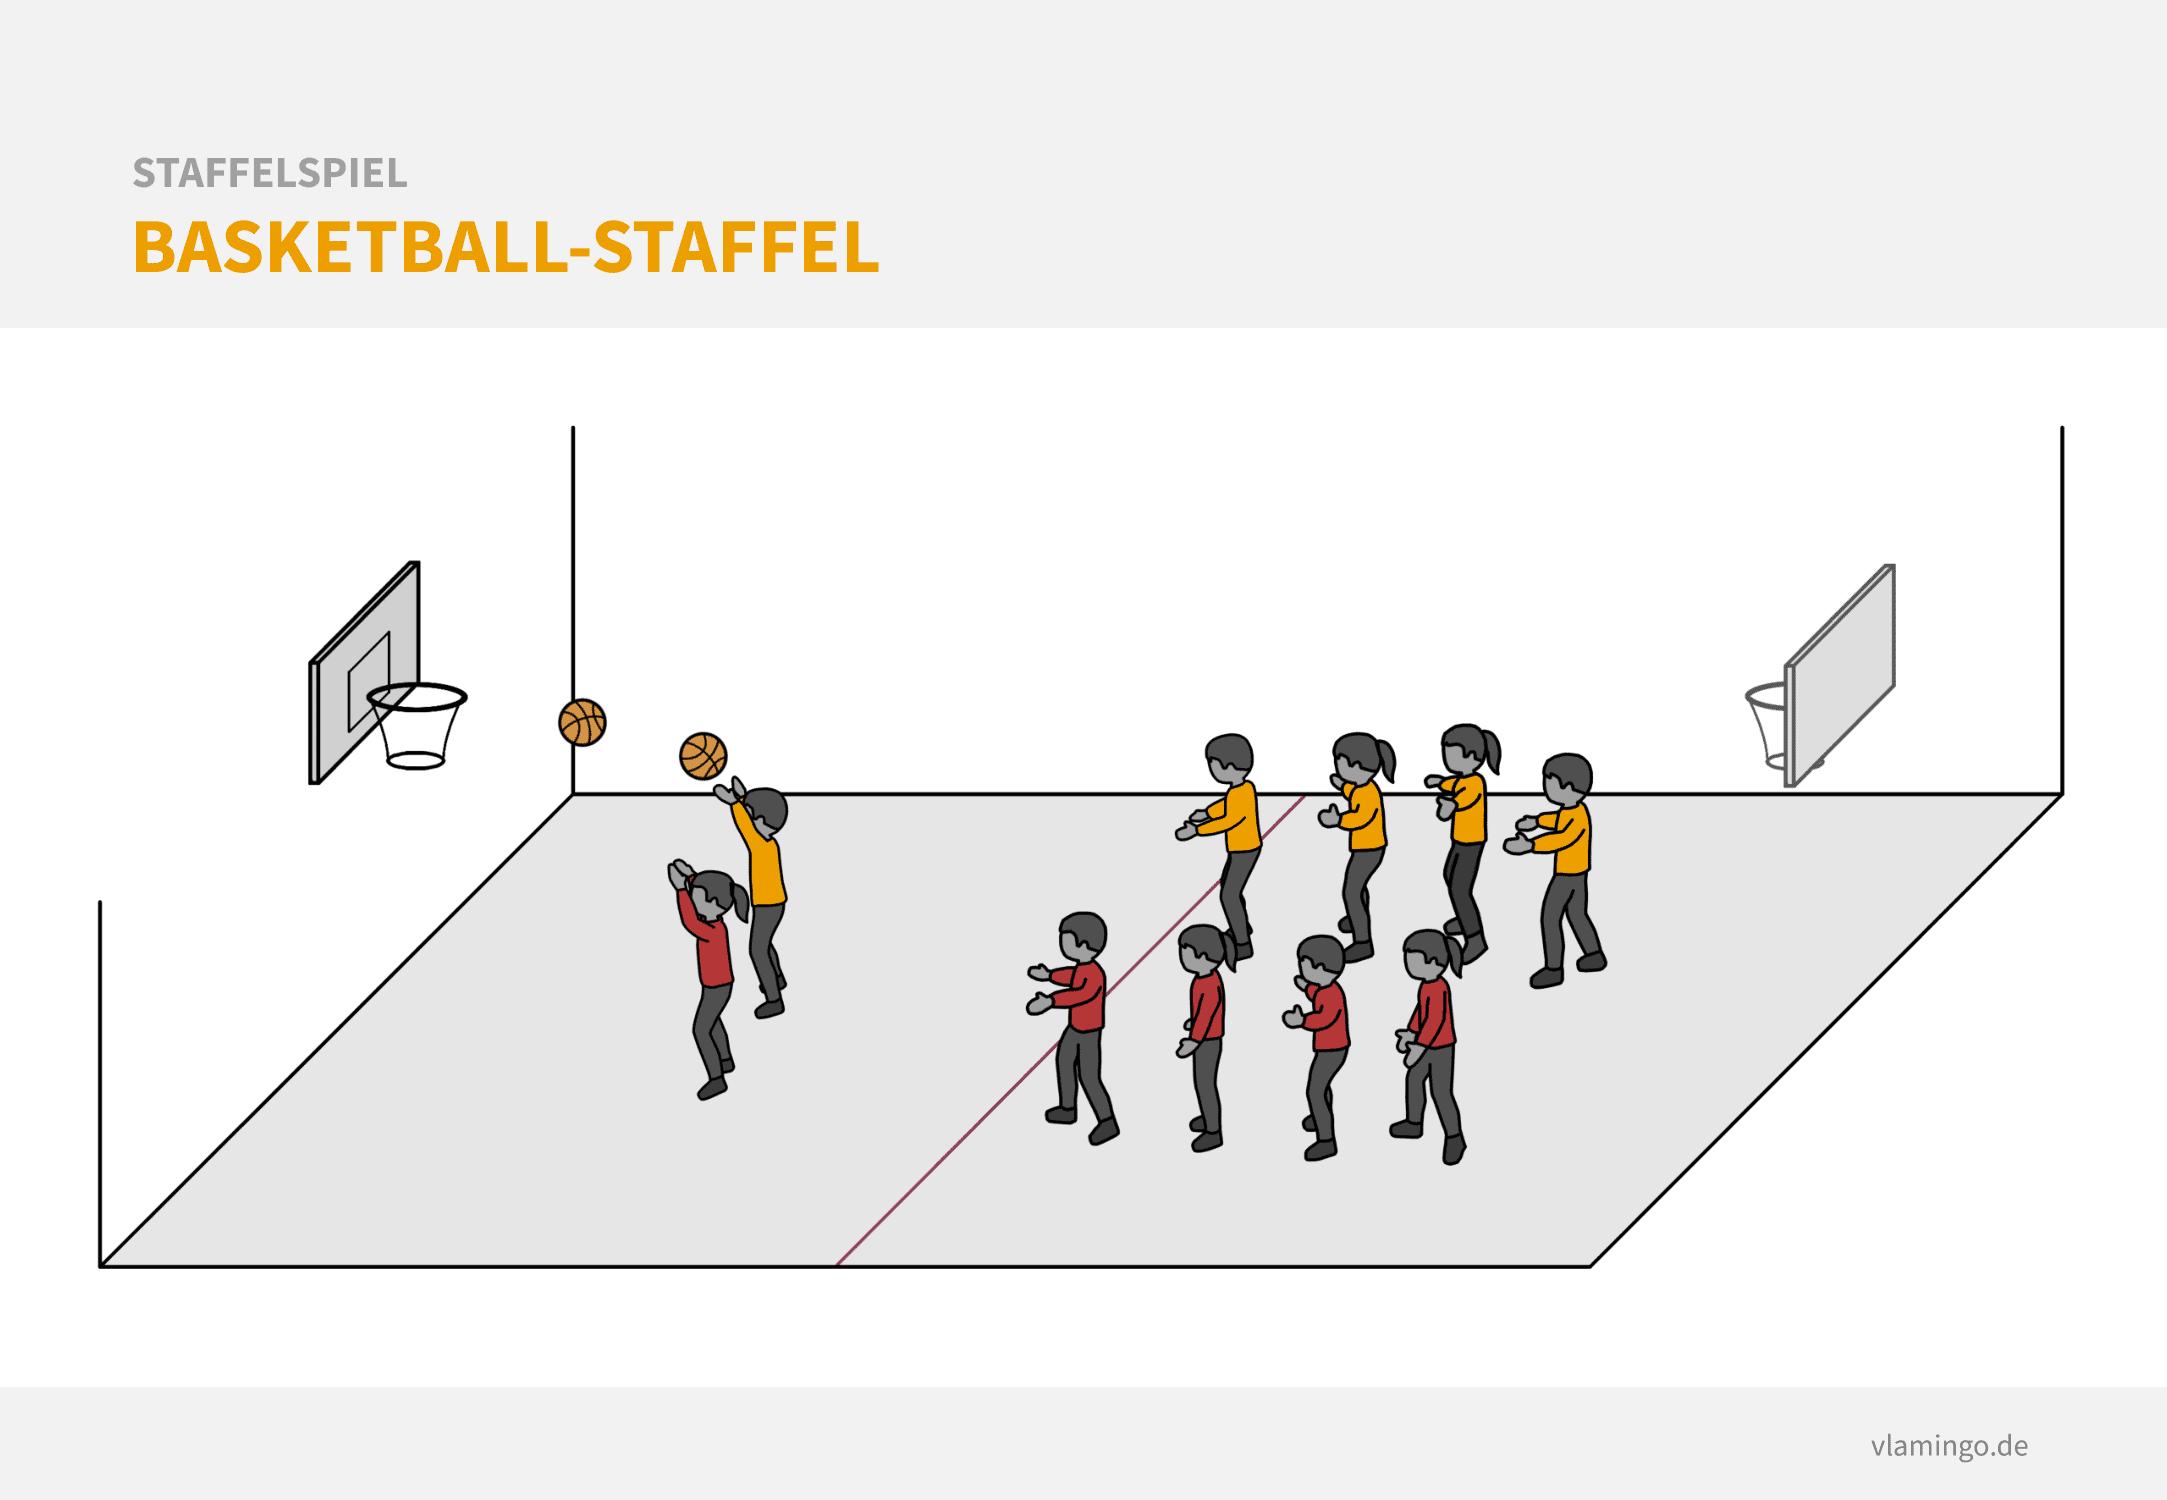 Staffelspiel - Basketball-Staffel